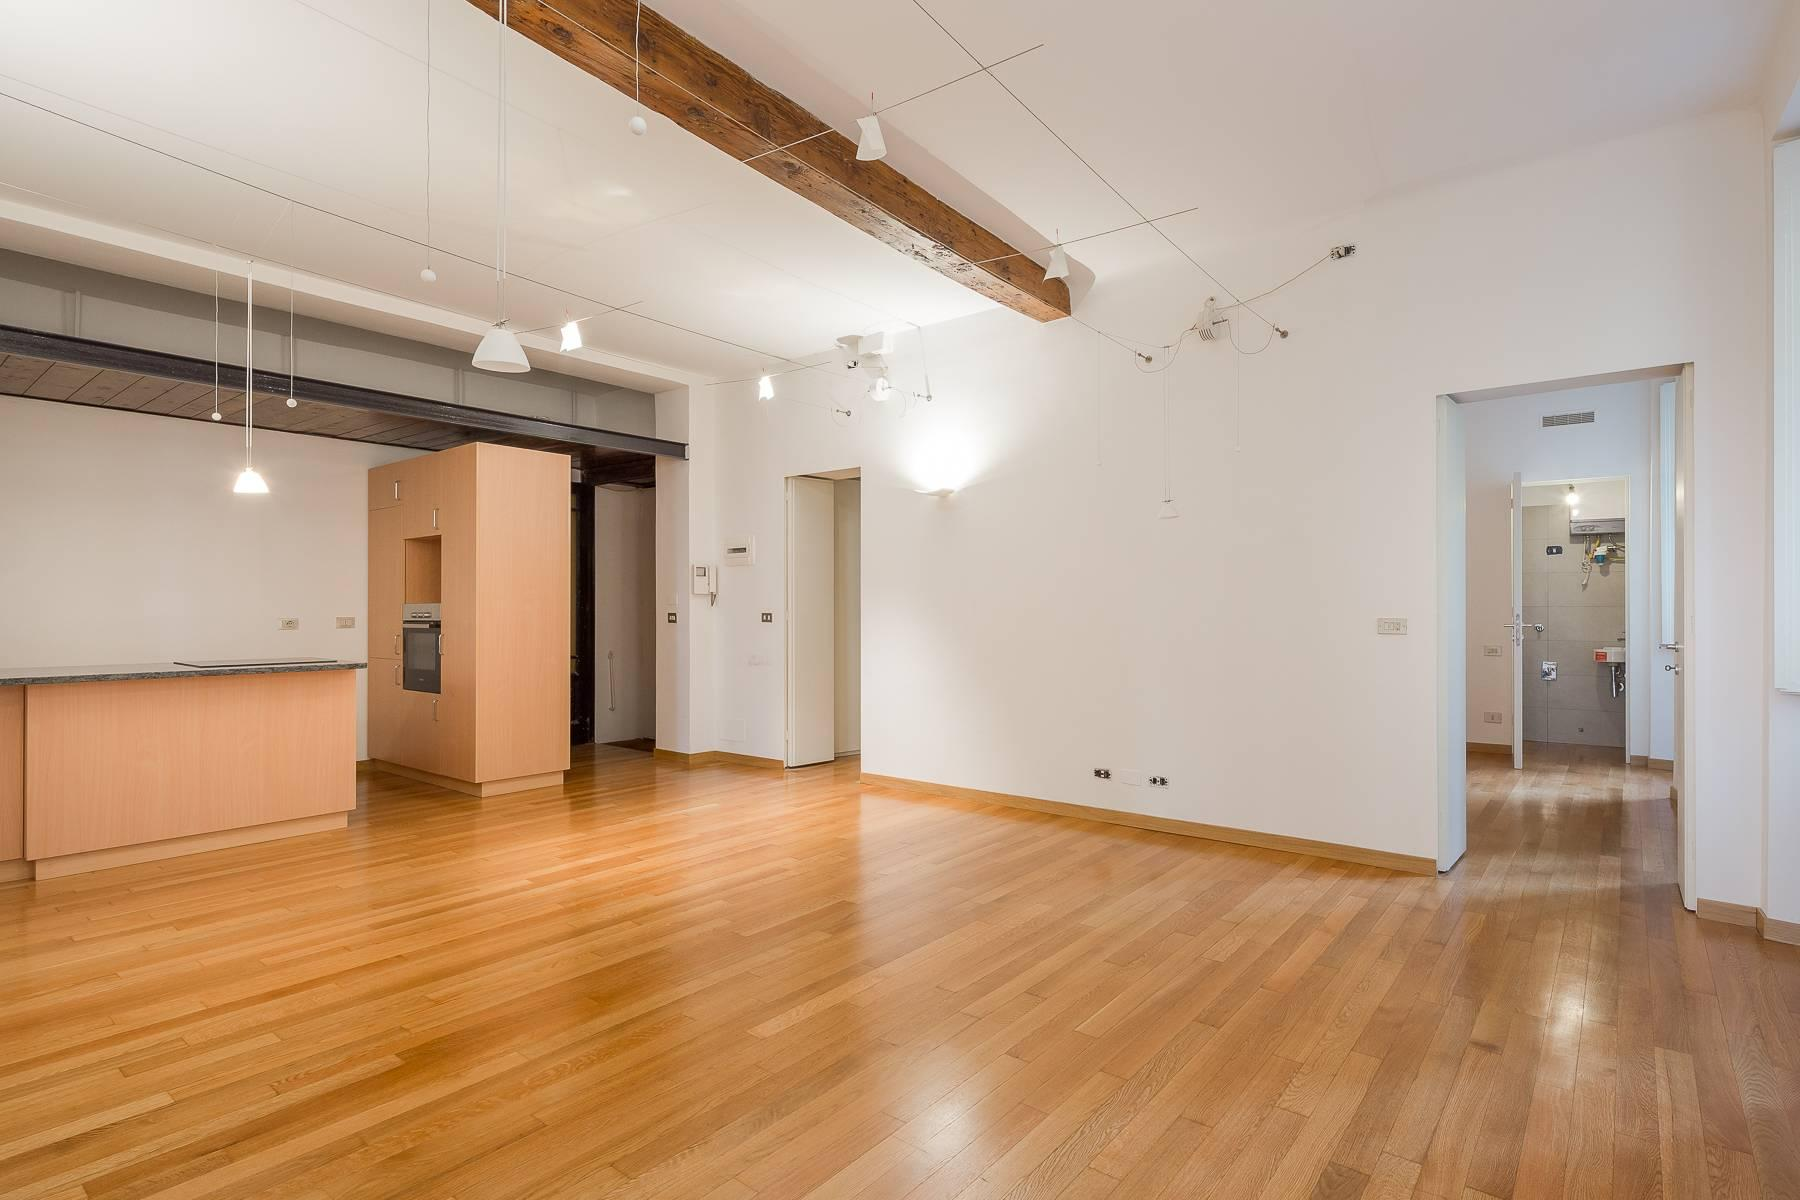 Apartment in an elegant period building located in a prestigious city district - 23